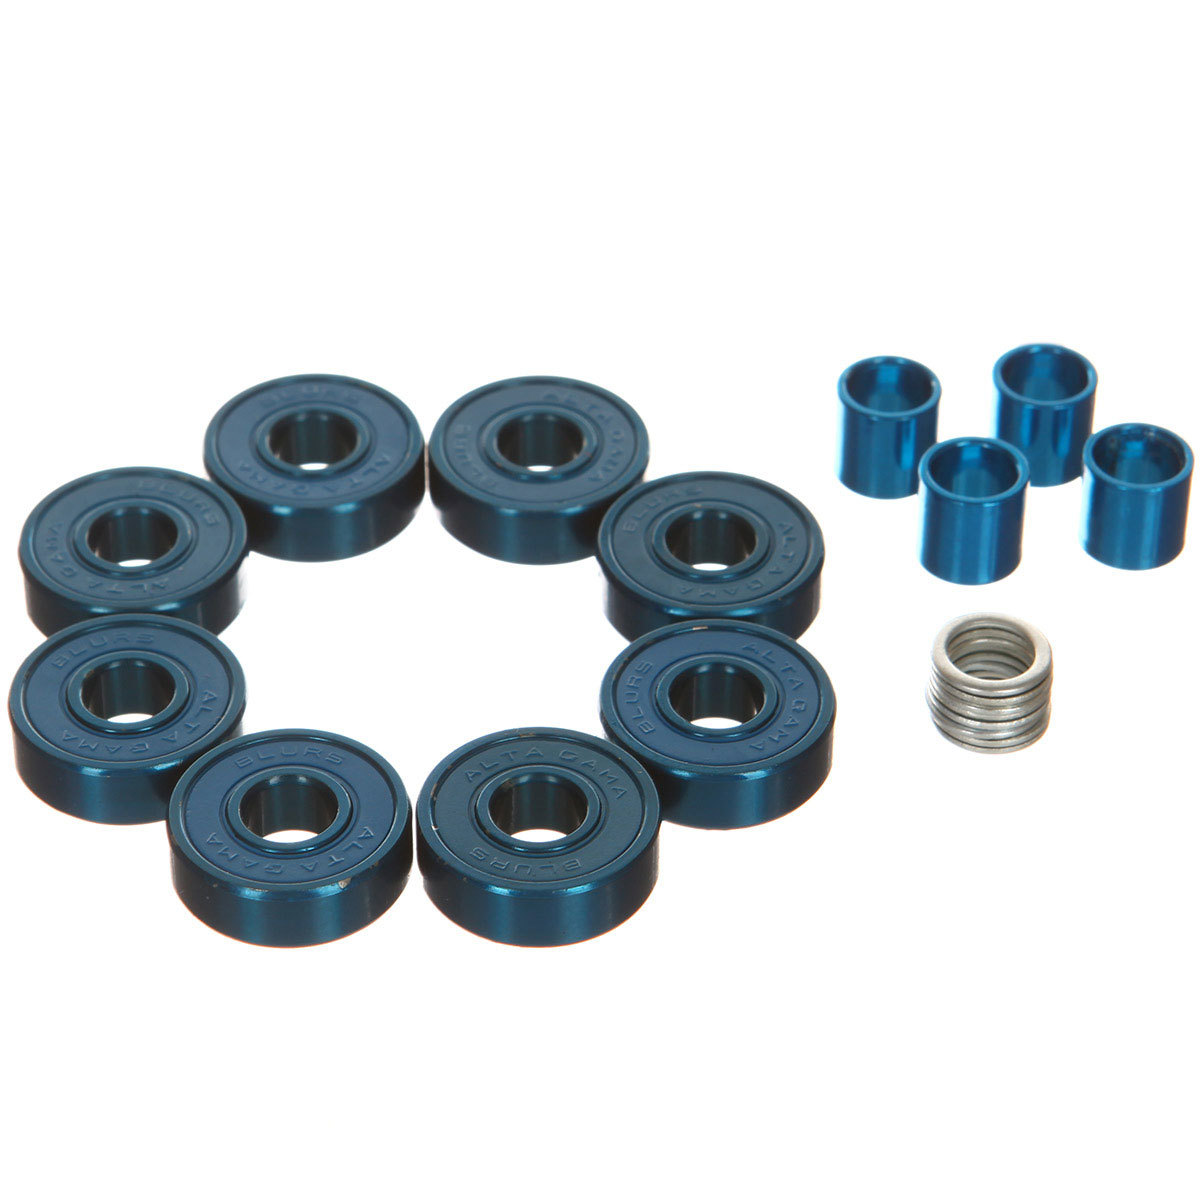 Подшипники для скейта BLURS Titanium Blue